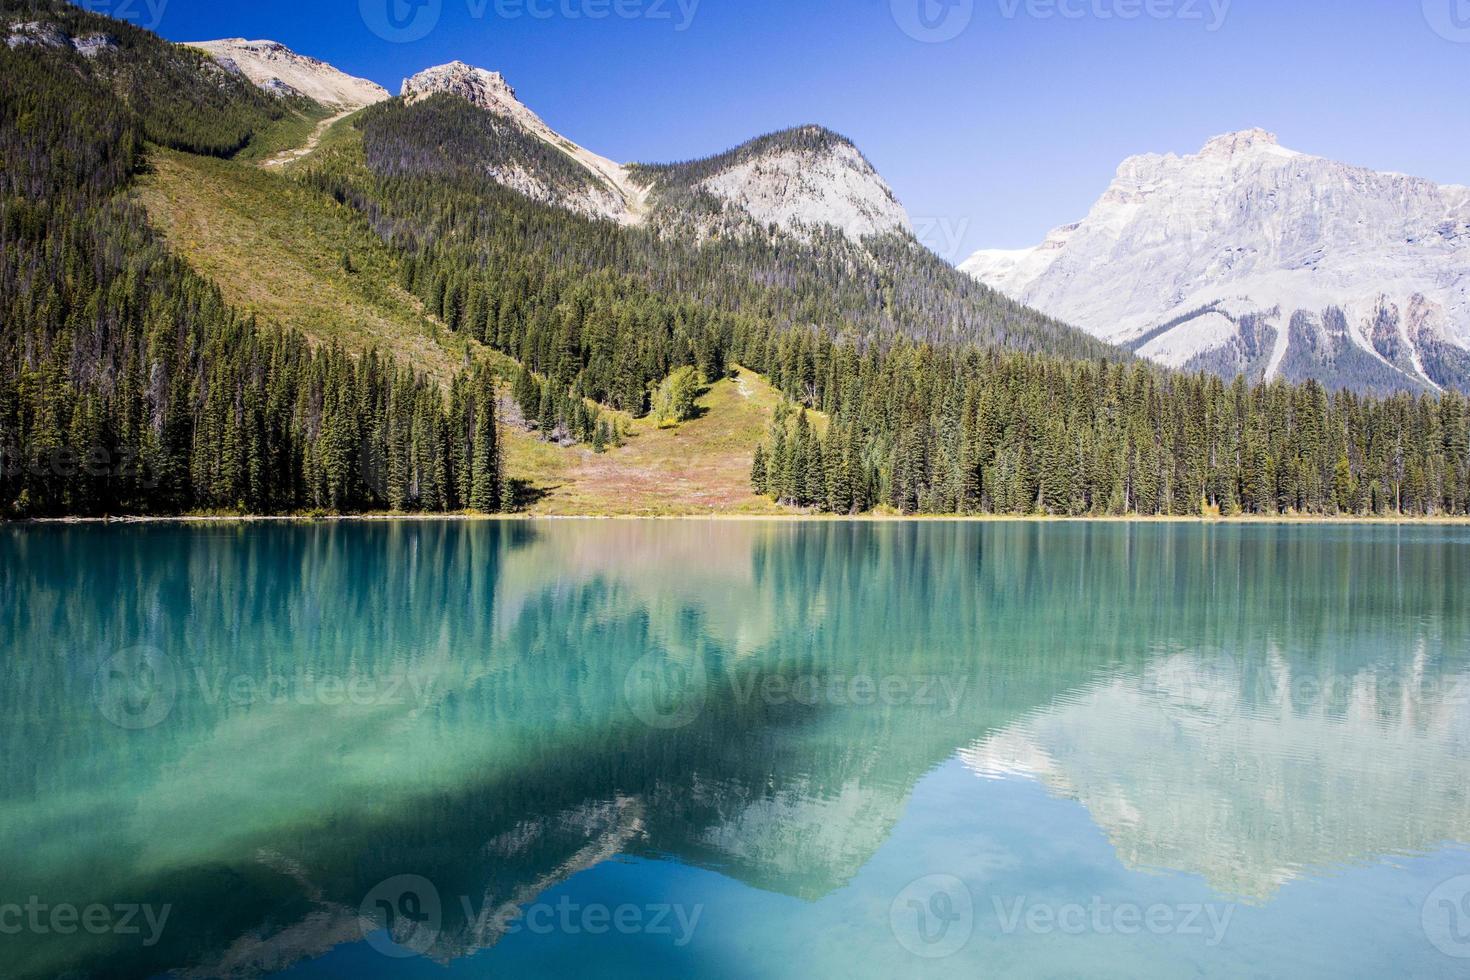 Emerald Lake, Yoho National Park, British Columbia, Canada photo